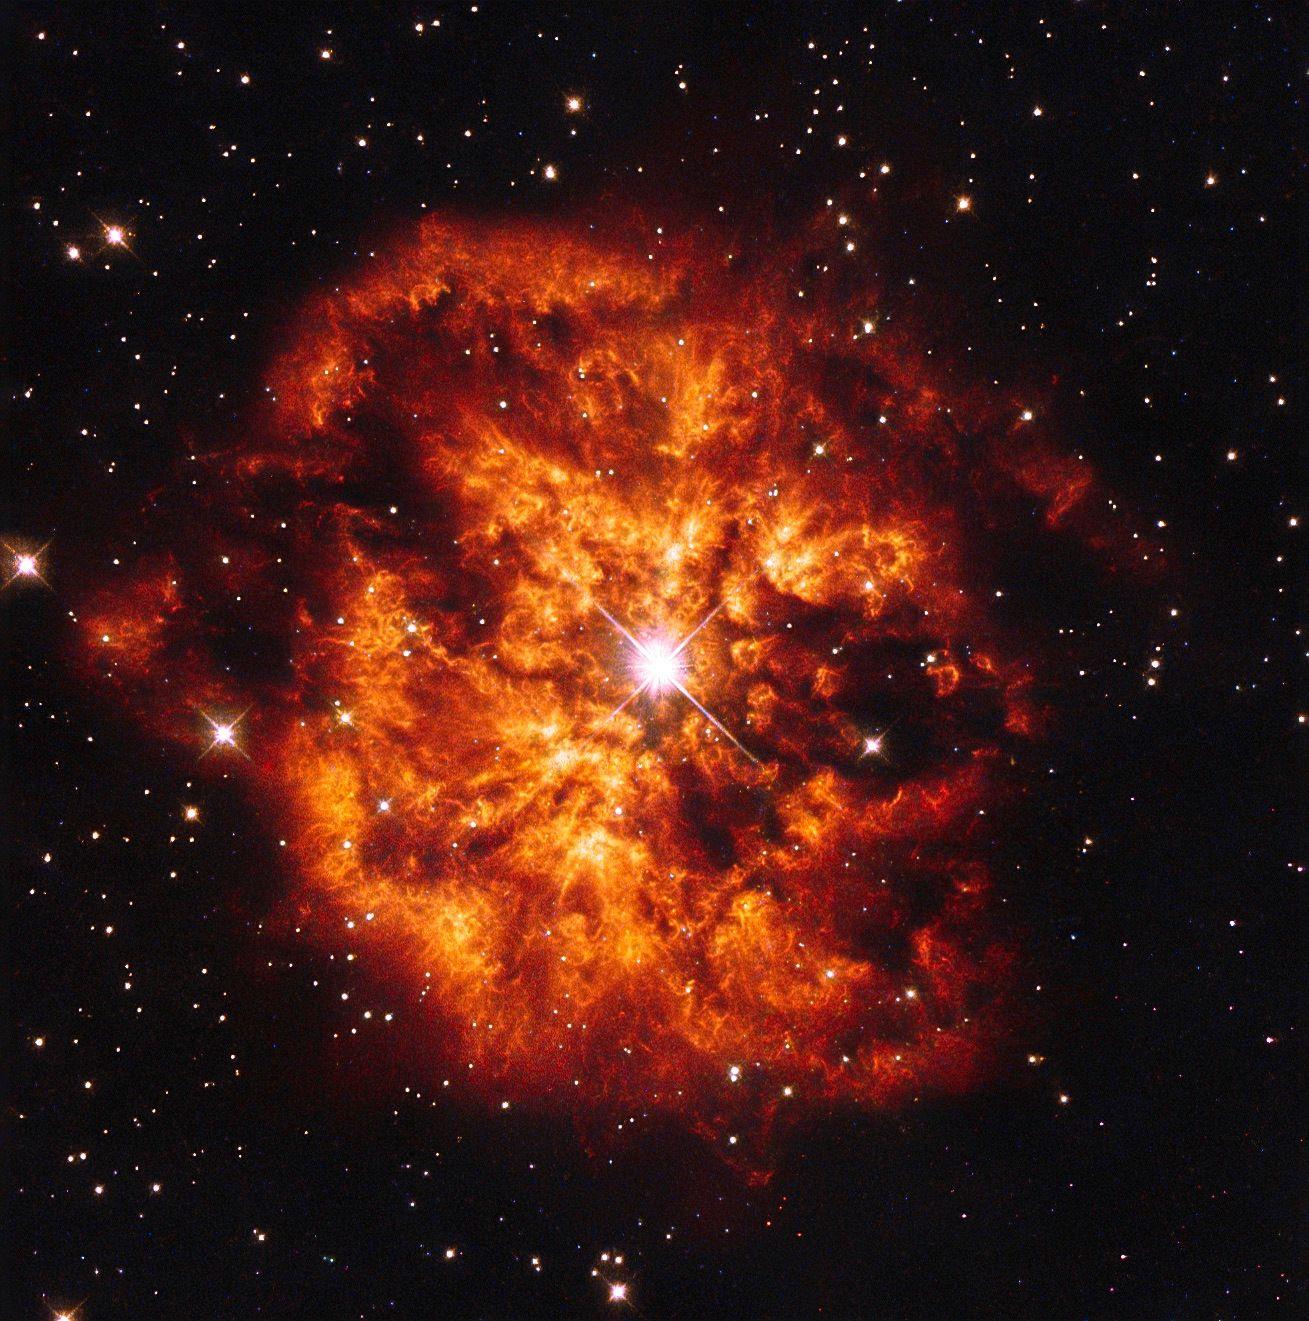 Hubble's fireball NASA/ESA Hubble Space Telescope e the central Wolf-Rayet star…